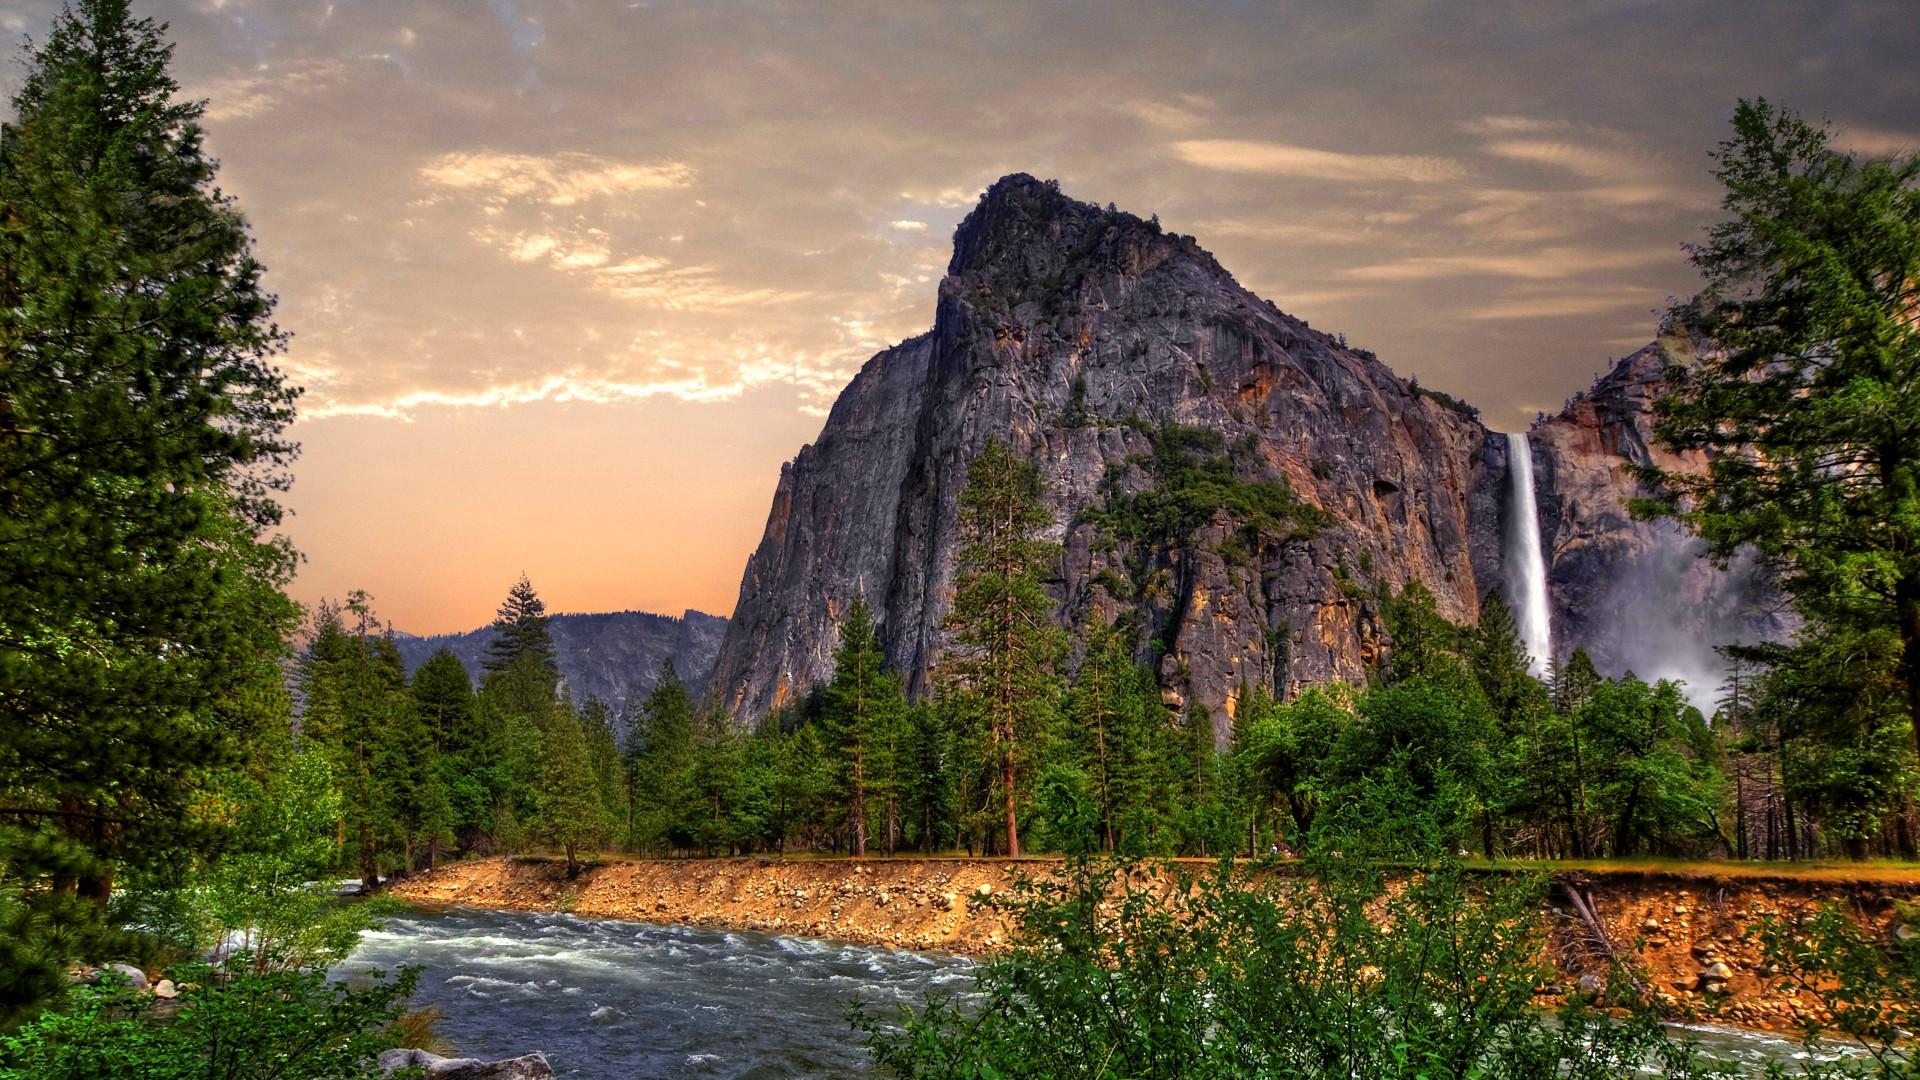 Hd wallpaper yosemite -  Ctrl Yosemite 5k 4k Wallpaper 8k Forest Osx Waterfall